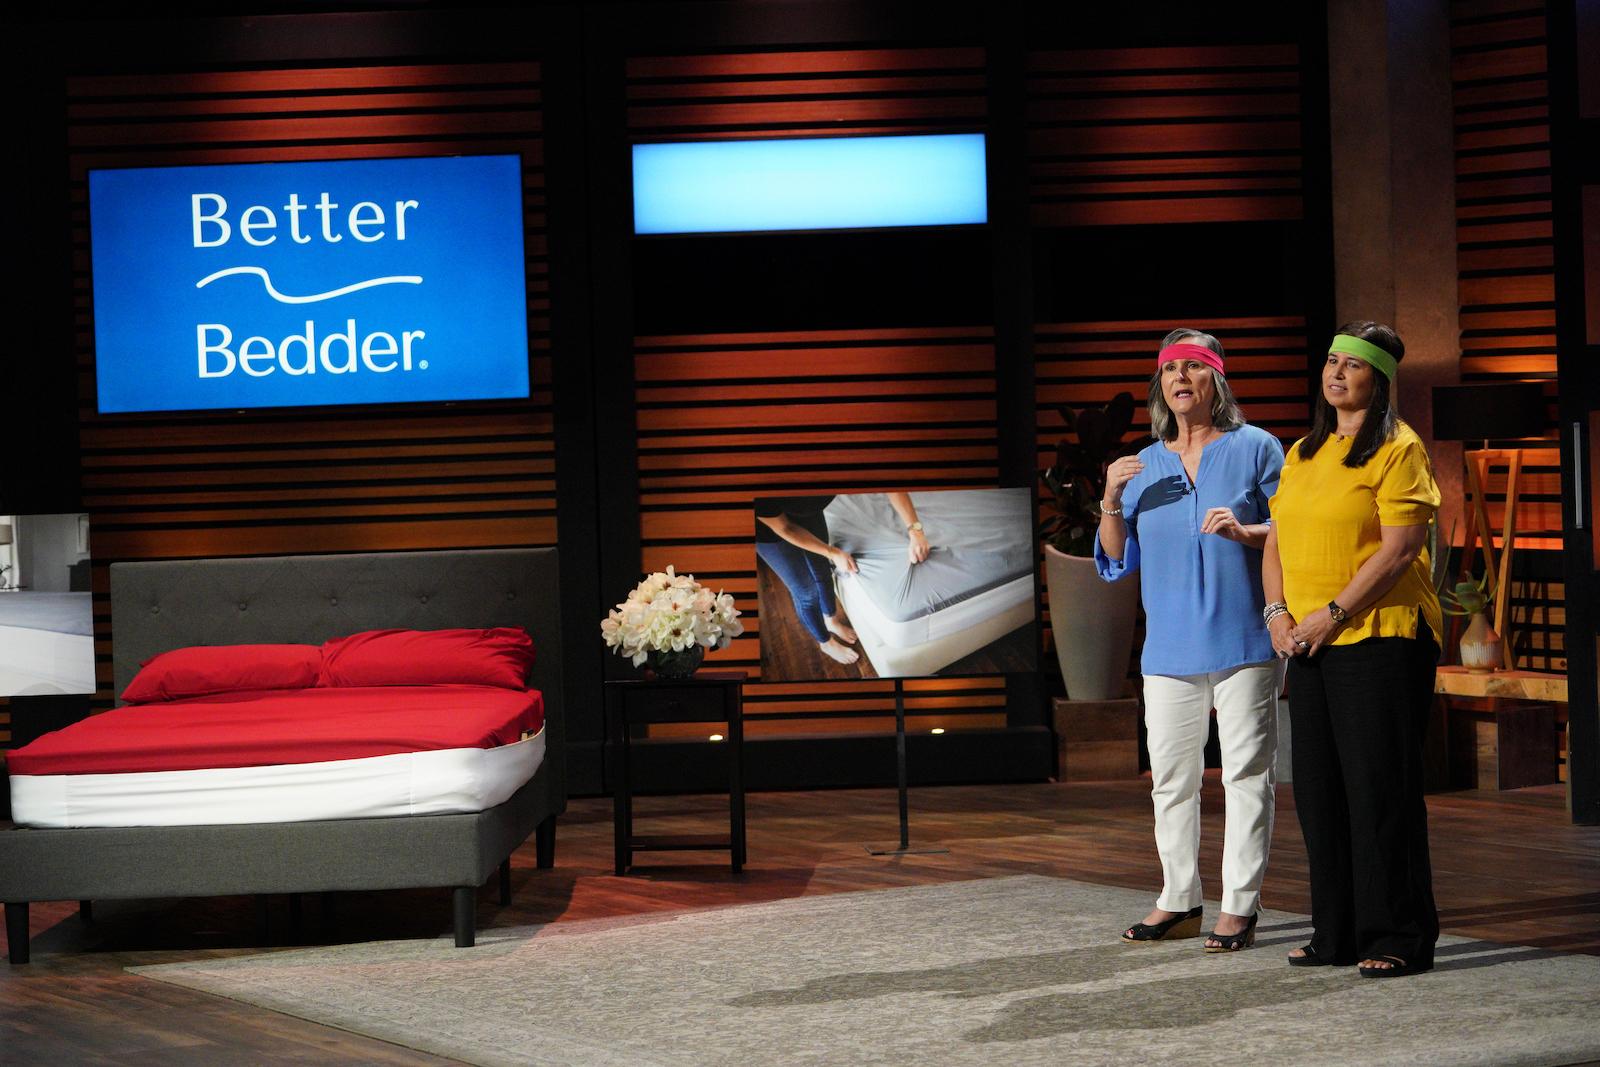 https allsharktankproducts com shark tank products home better bedder bed sheet holder belt